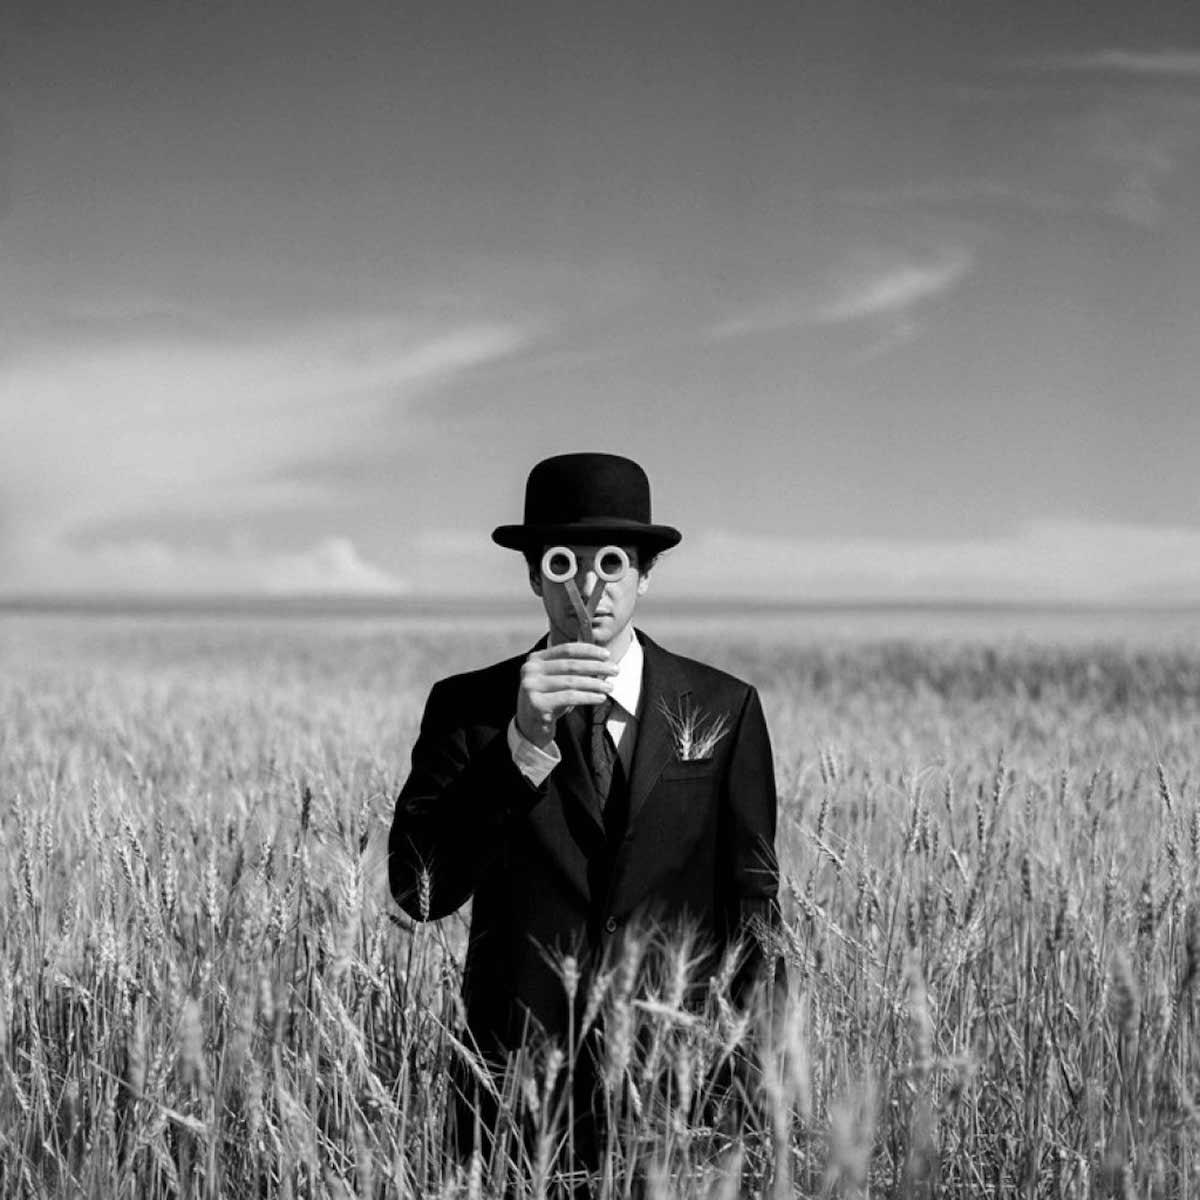 Rodney-Smith-Fine-Art-Photography-13.jpg